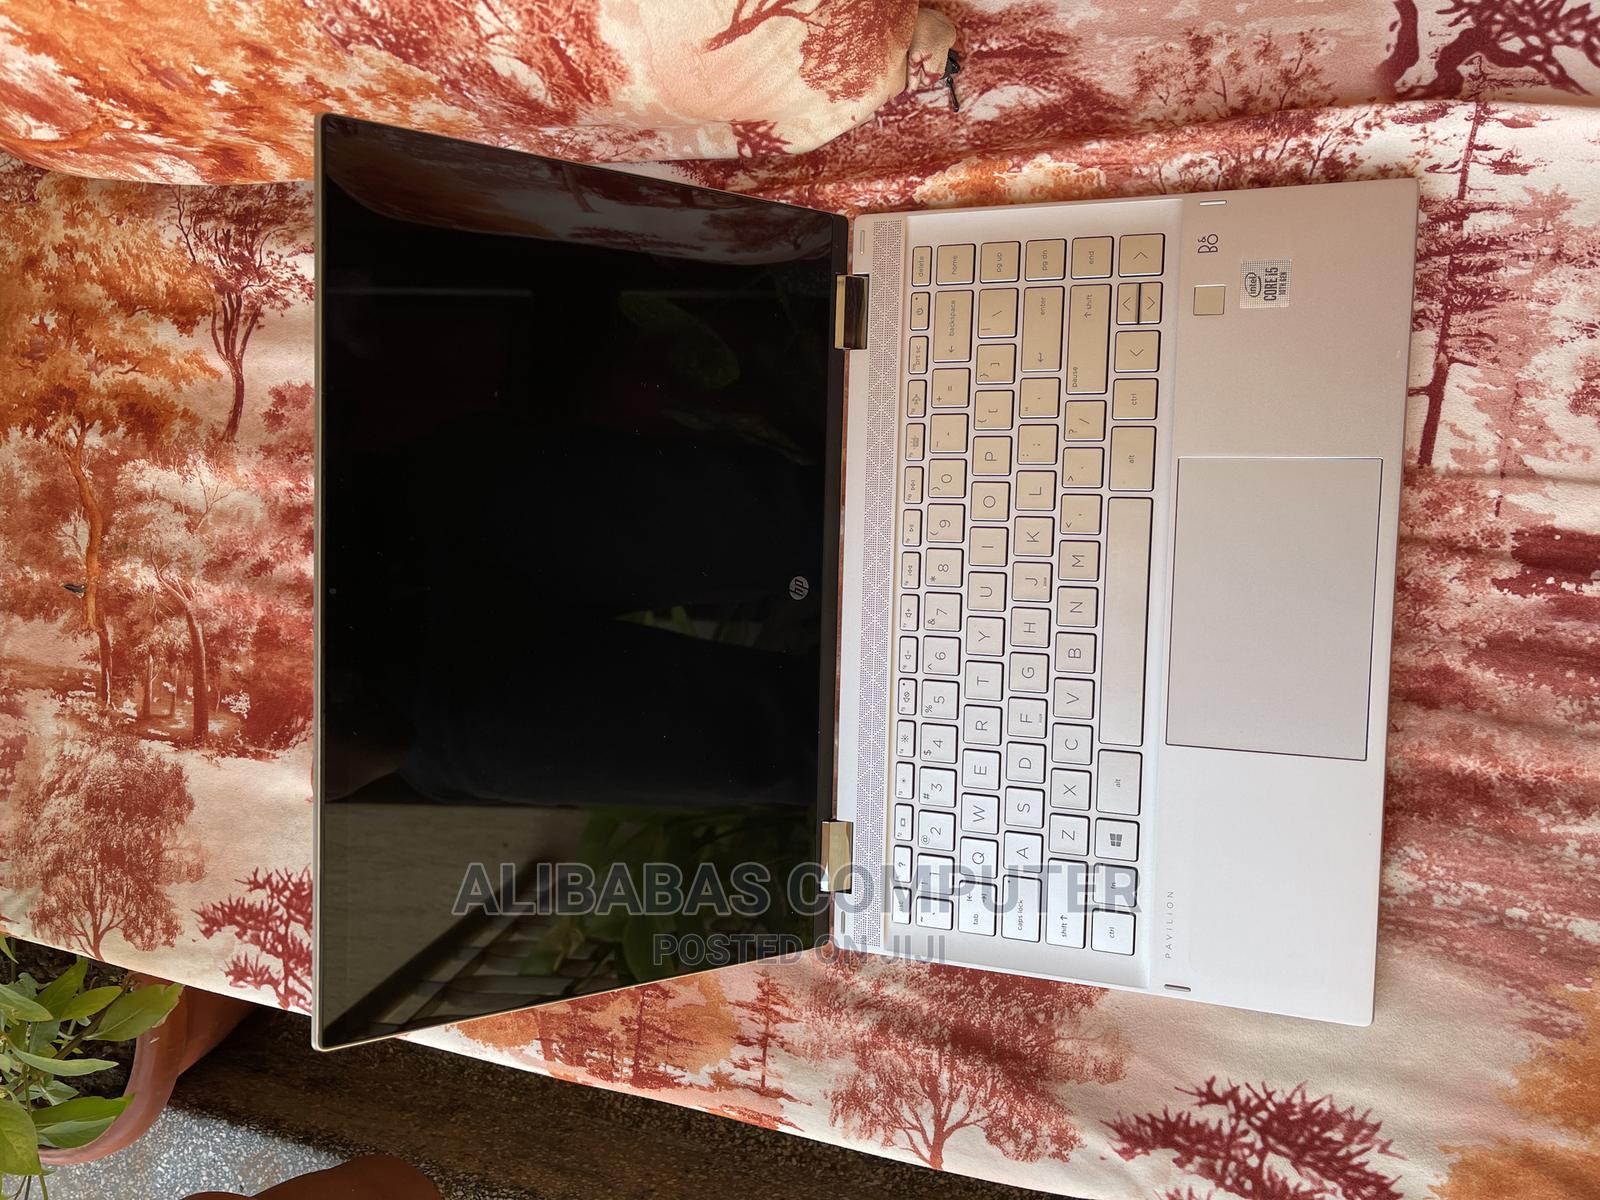 New Laptop HP Pavilion X360 8GB Intel Core I5 SSHD (Hybrid) 512GB | Laptops & Computers for sale in Kampala, Uganda